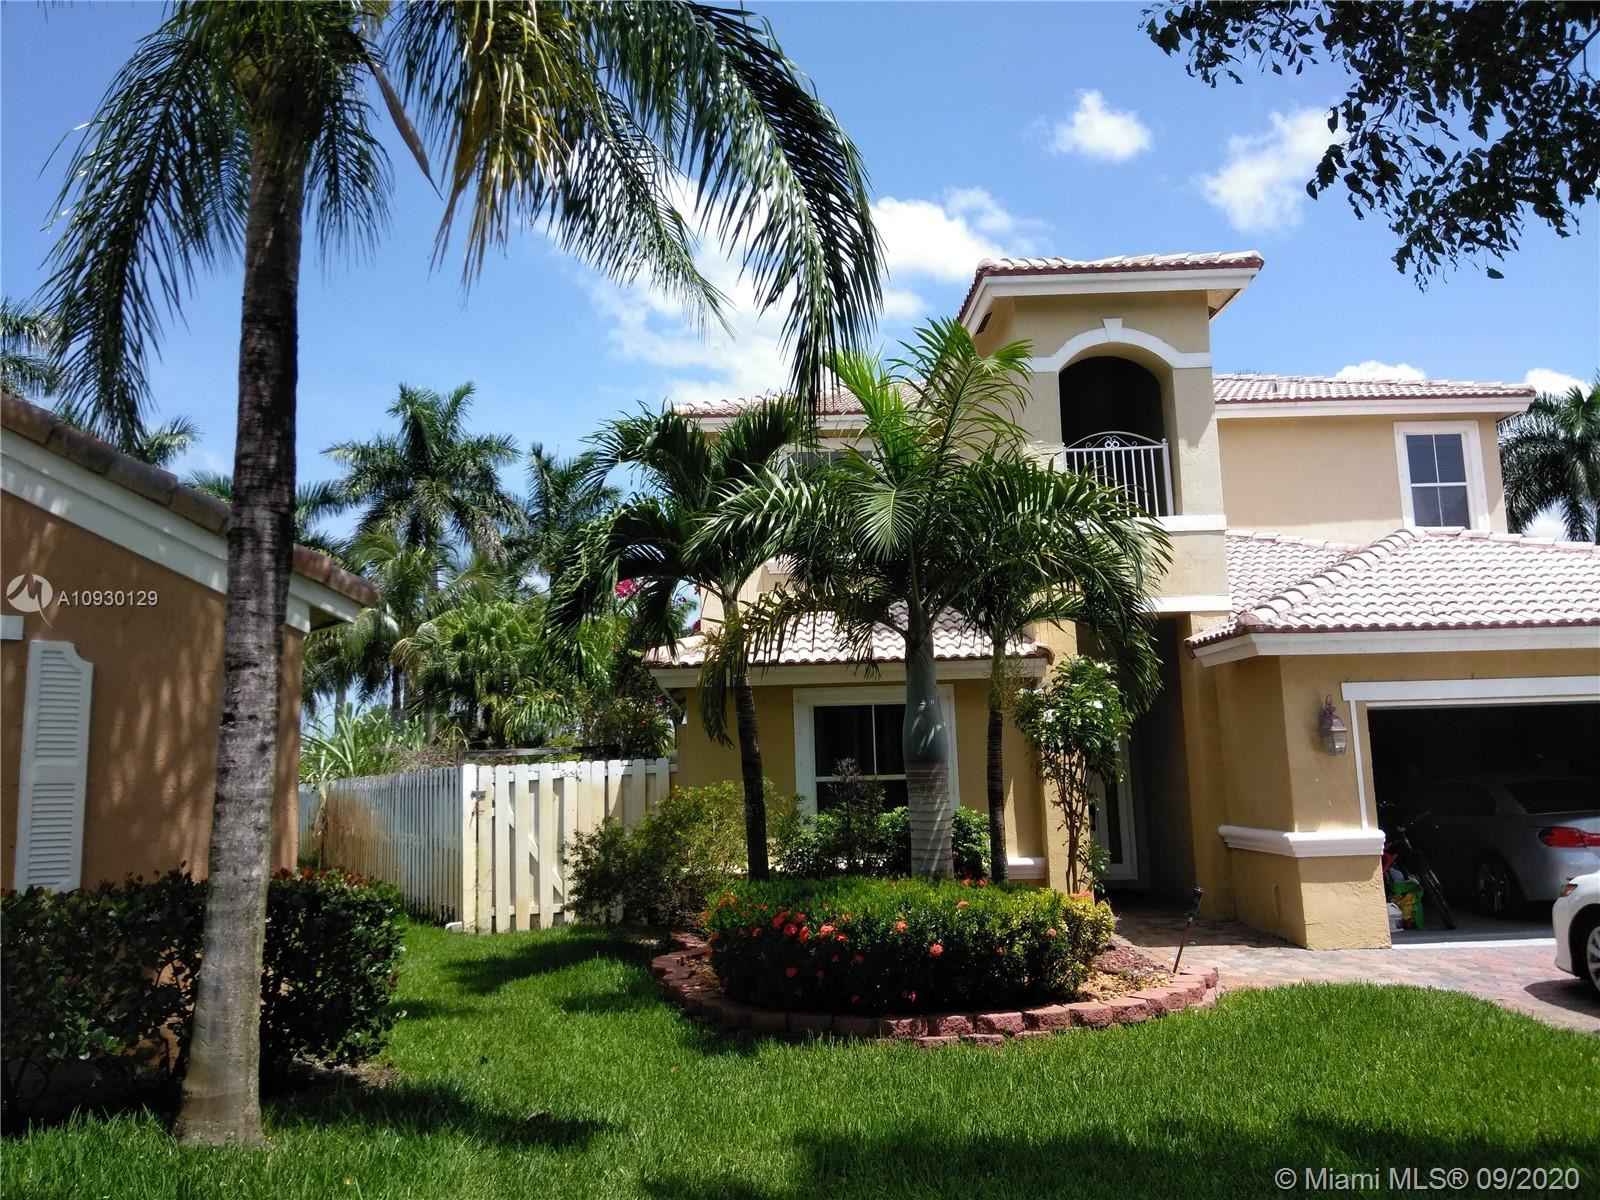 Photo of 2604 SW 135th Ave, Miramar, FL 33027 (MLS # A10930129)